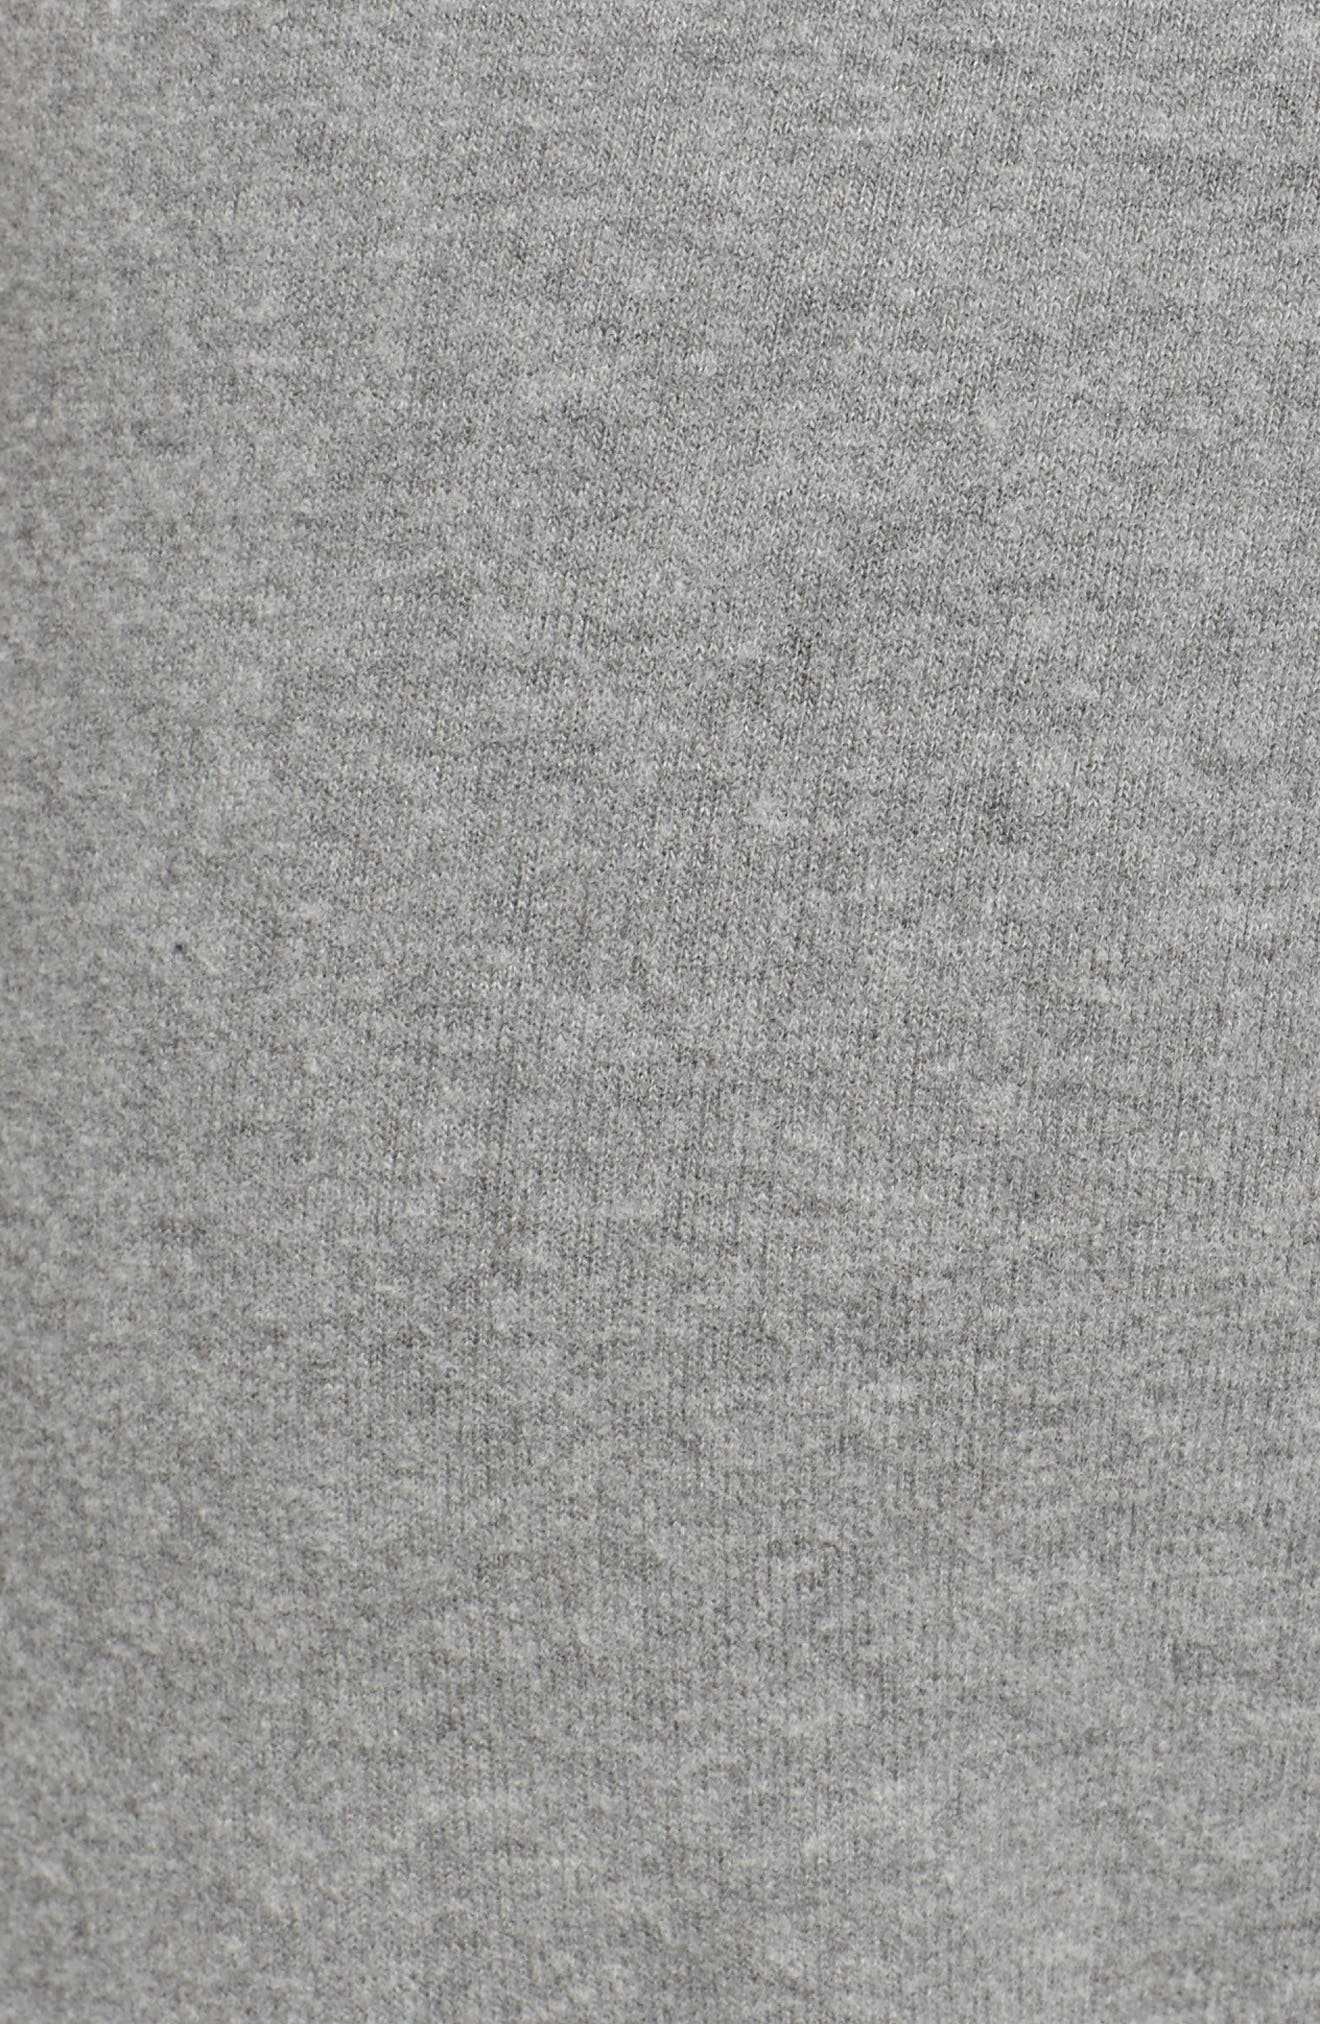 Brushed Hacci Lounge Jogger Pants,                             Alternate thumbnail 5, color,                             052